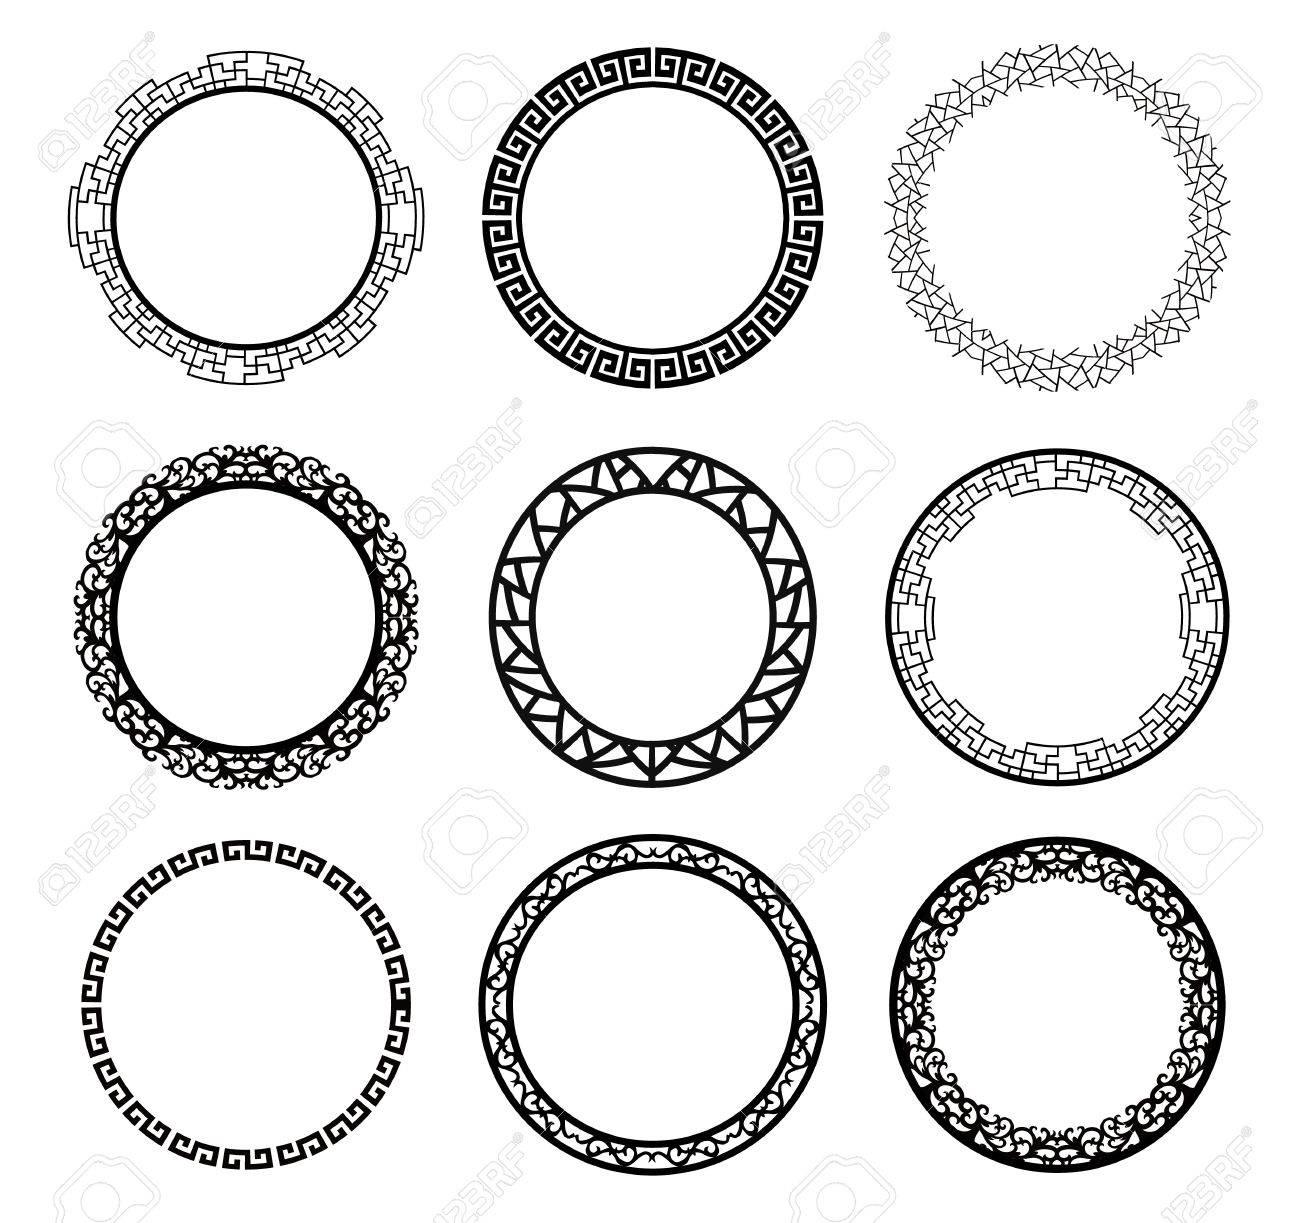 Vector Circle Frame Set Royalty Free Cliparts, Vectors, And Stock ...